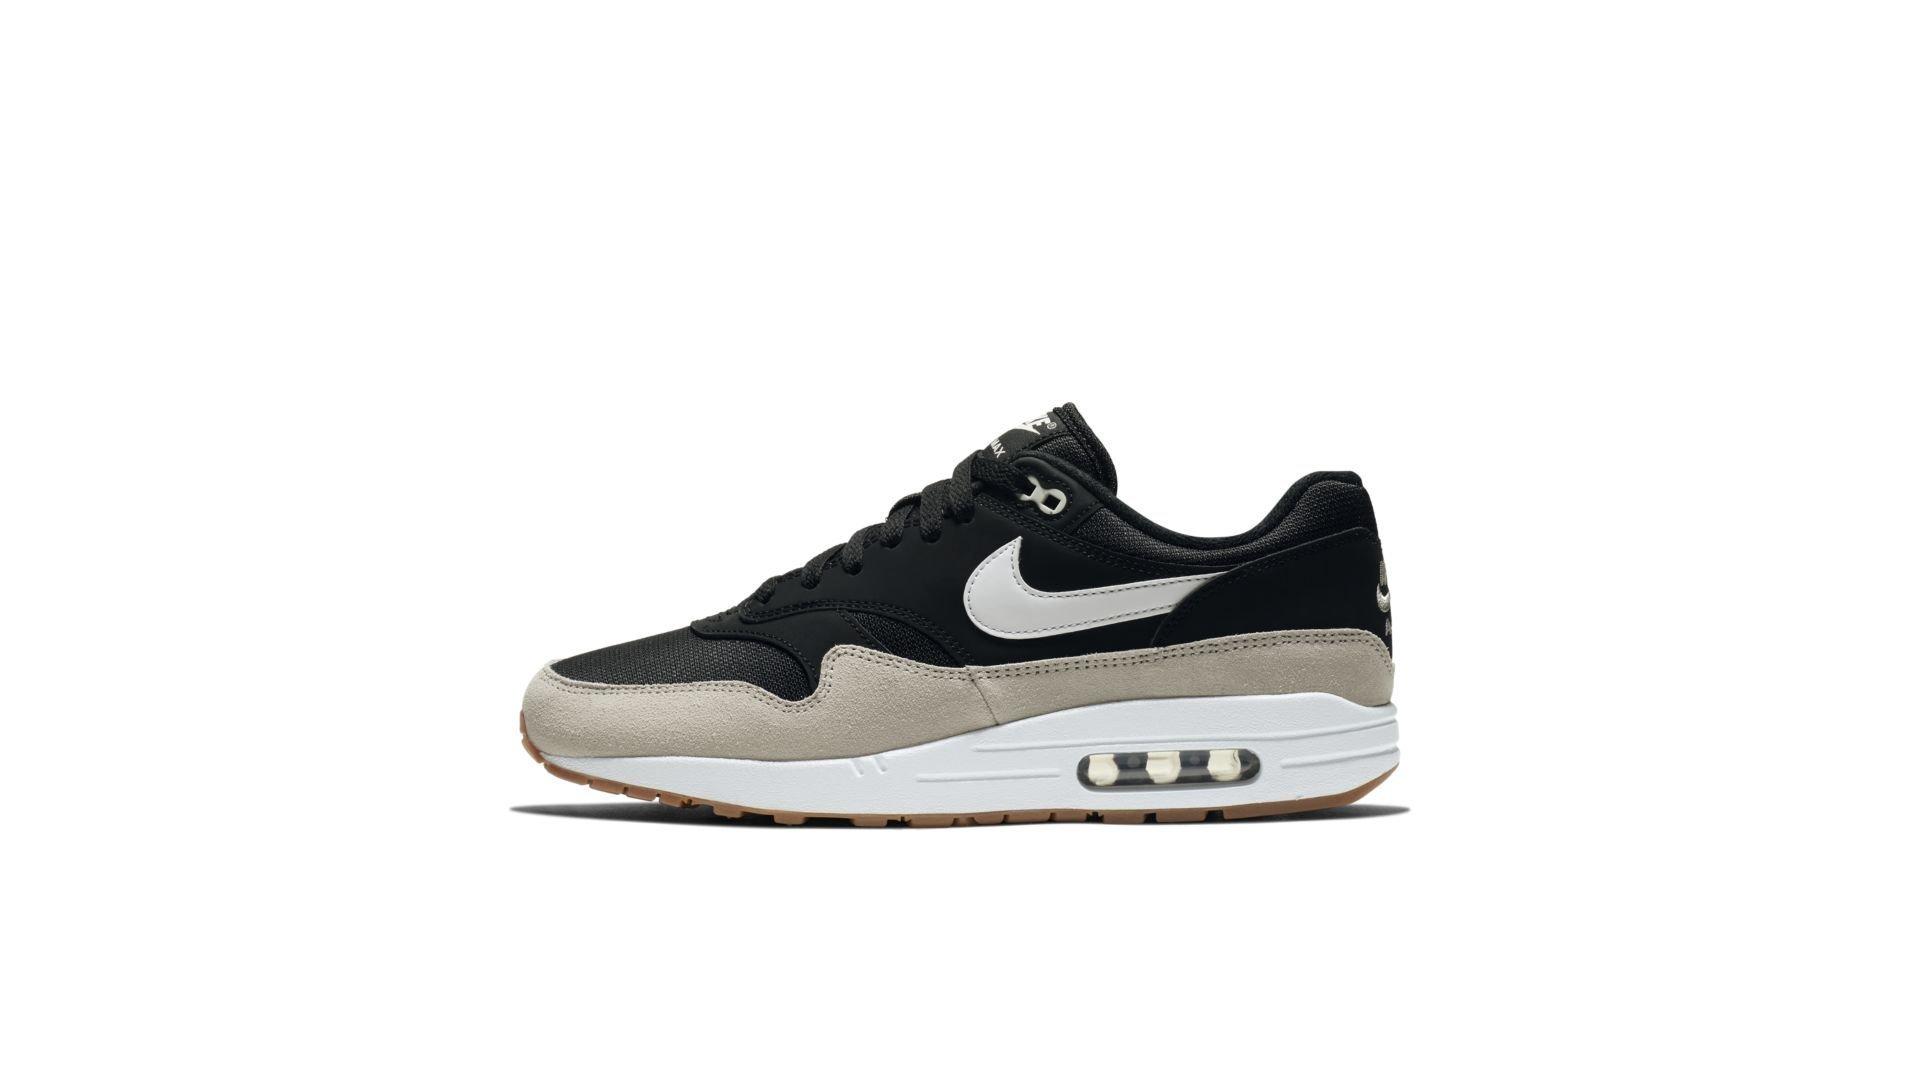 uk availability 08c3d c477d Nike Air Max 1 Black  White (AH8145-009)